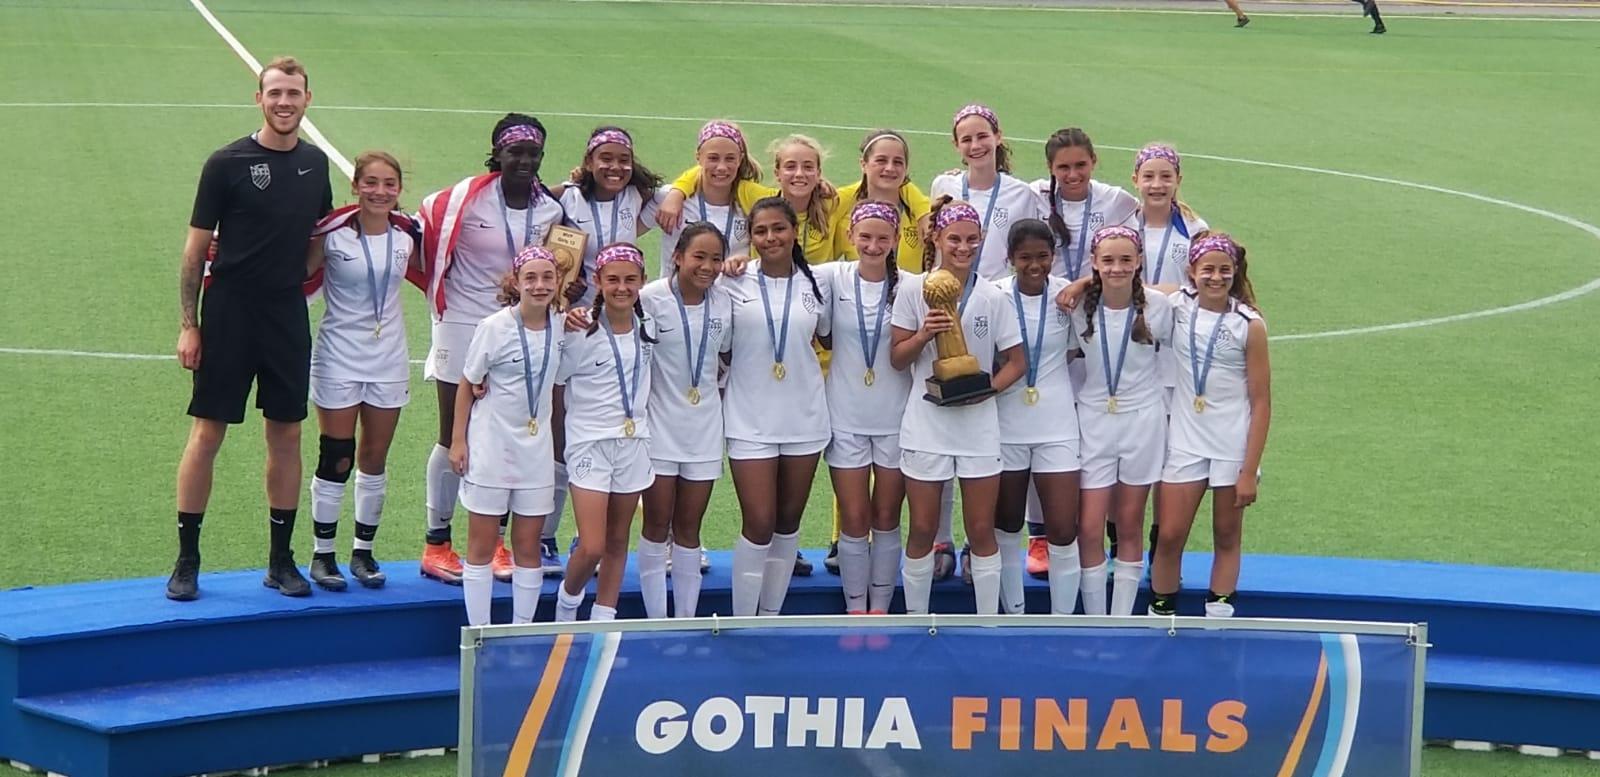 Team photo of Girls Gothia Soccer Finals